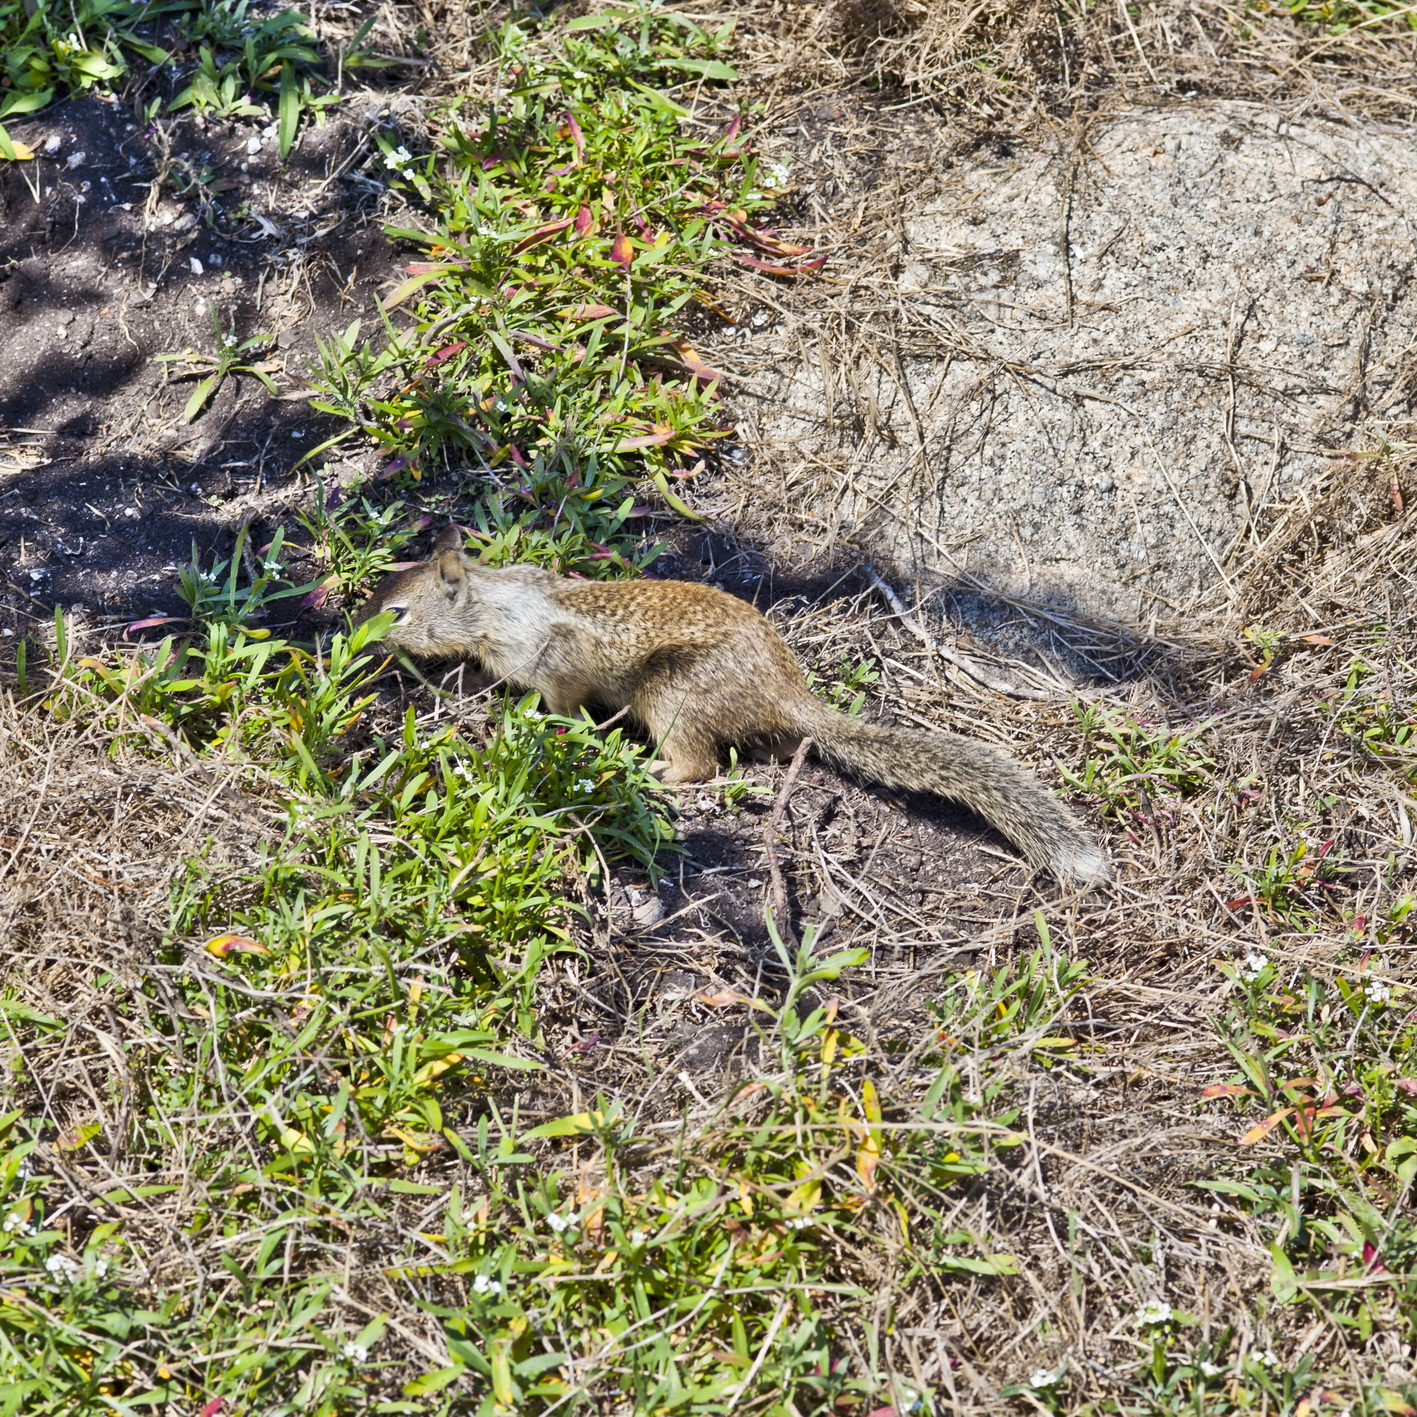 California ground squirrel Otospermophilus beecheyi 17 Mile Drive Monterey CA July 2011 16